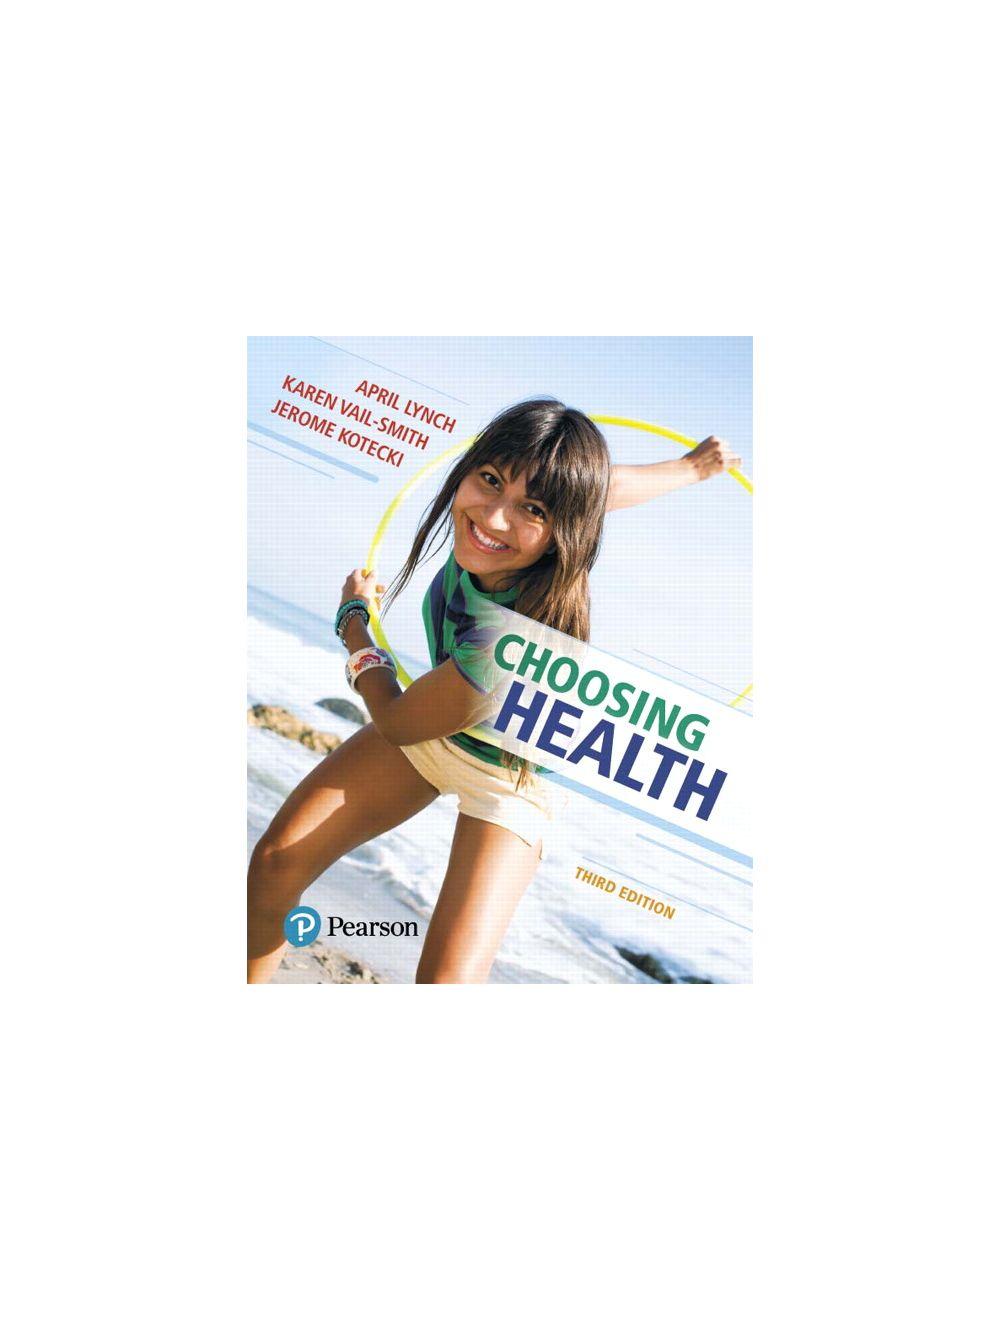 Test Bank for Choosing Health 3rd Edition by Lynch